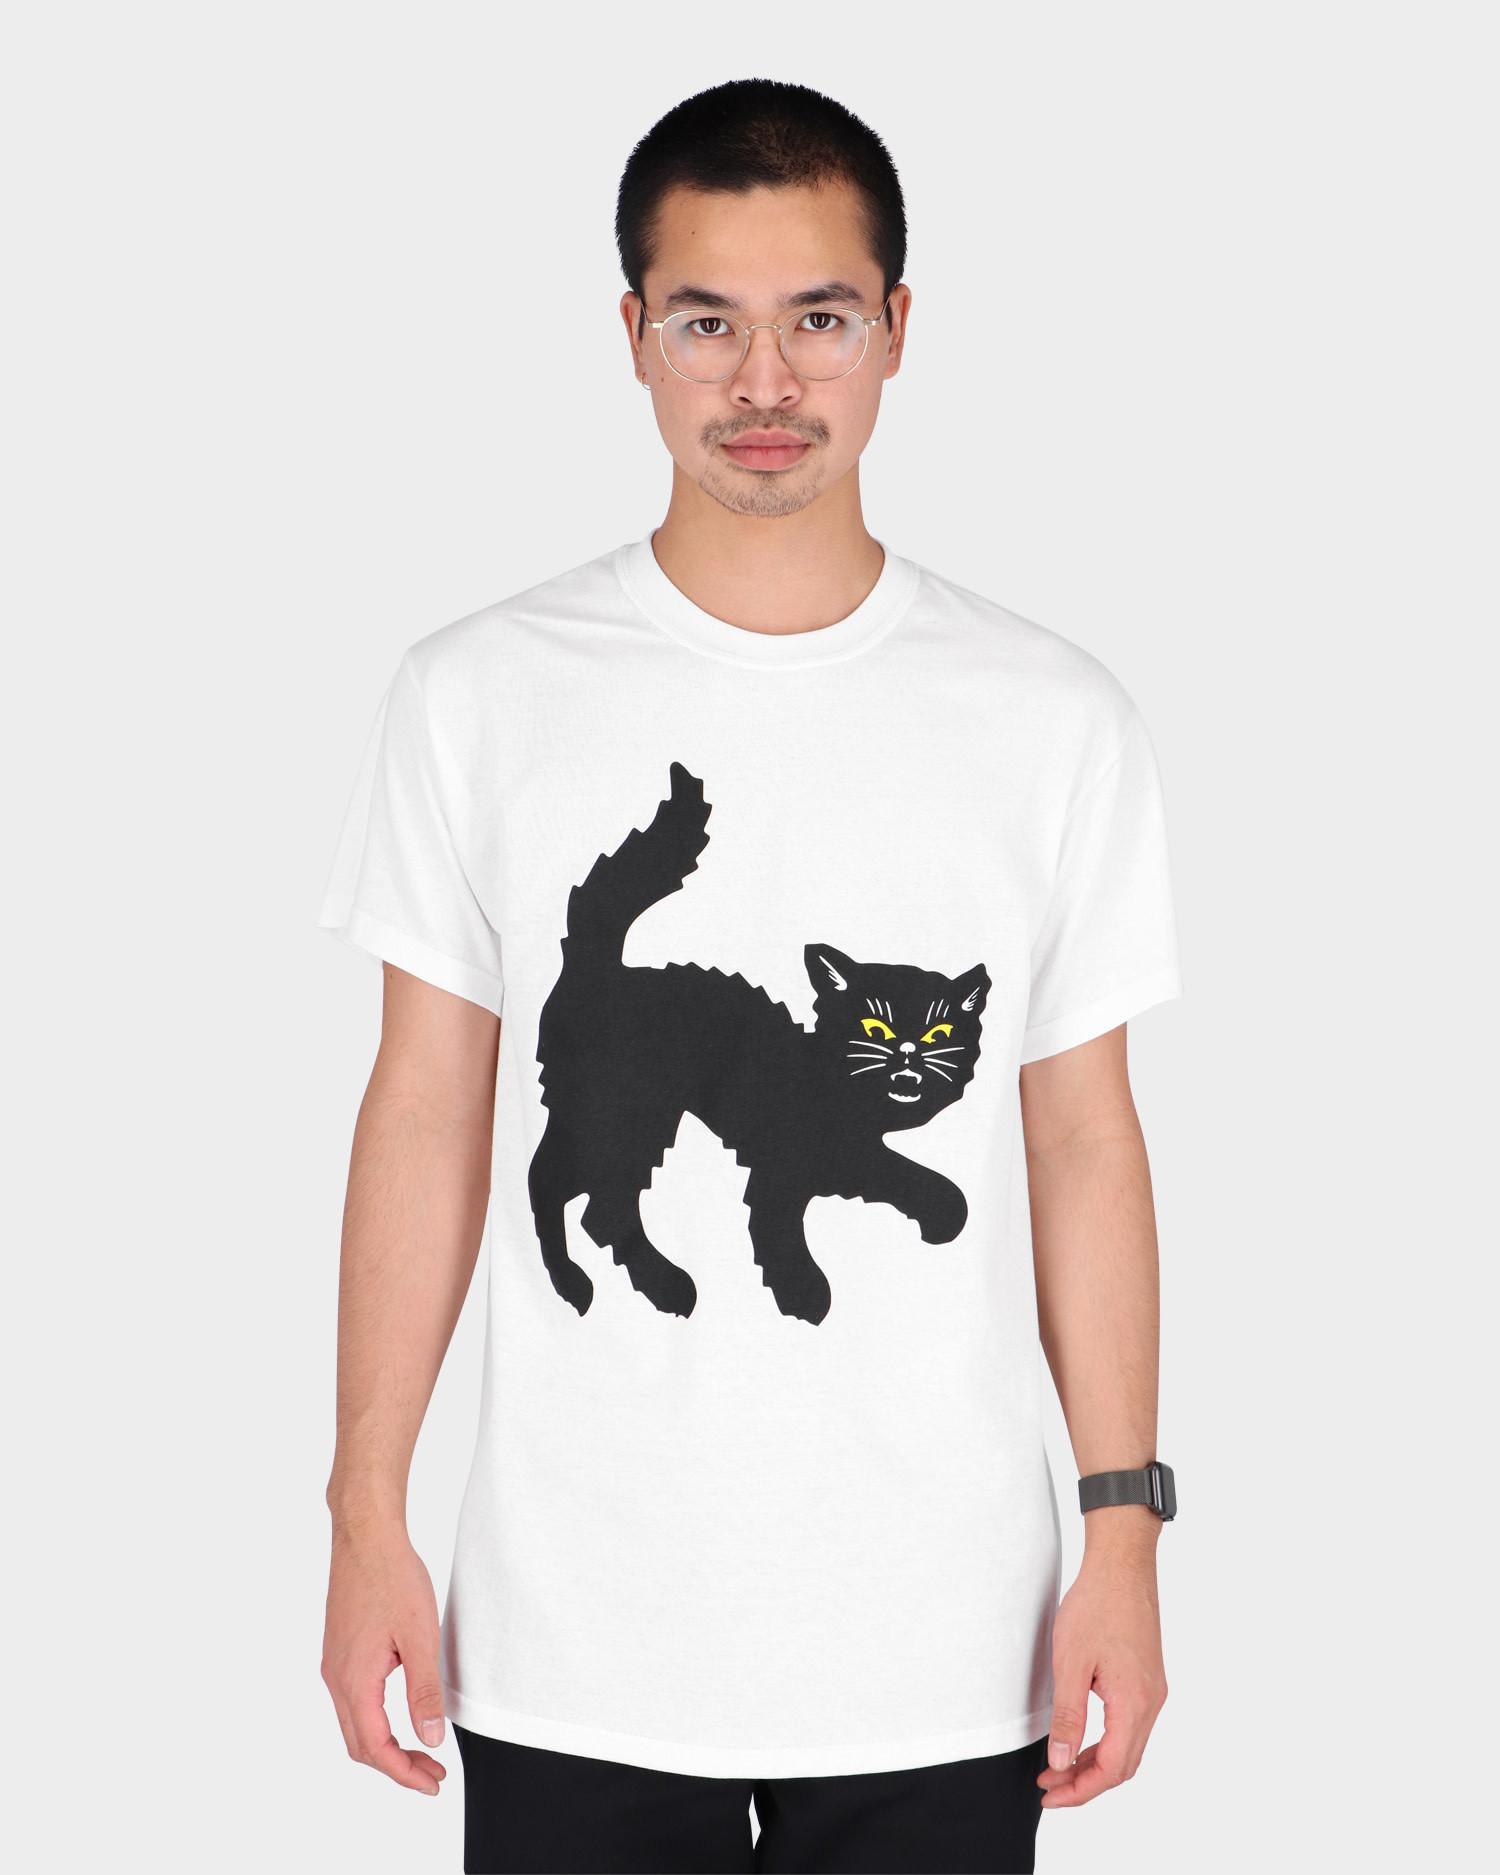 Call me 917 Black Cat T-Shirt White